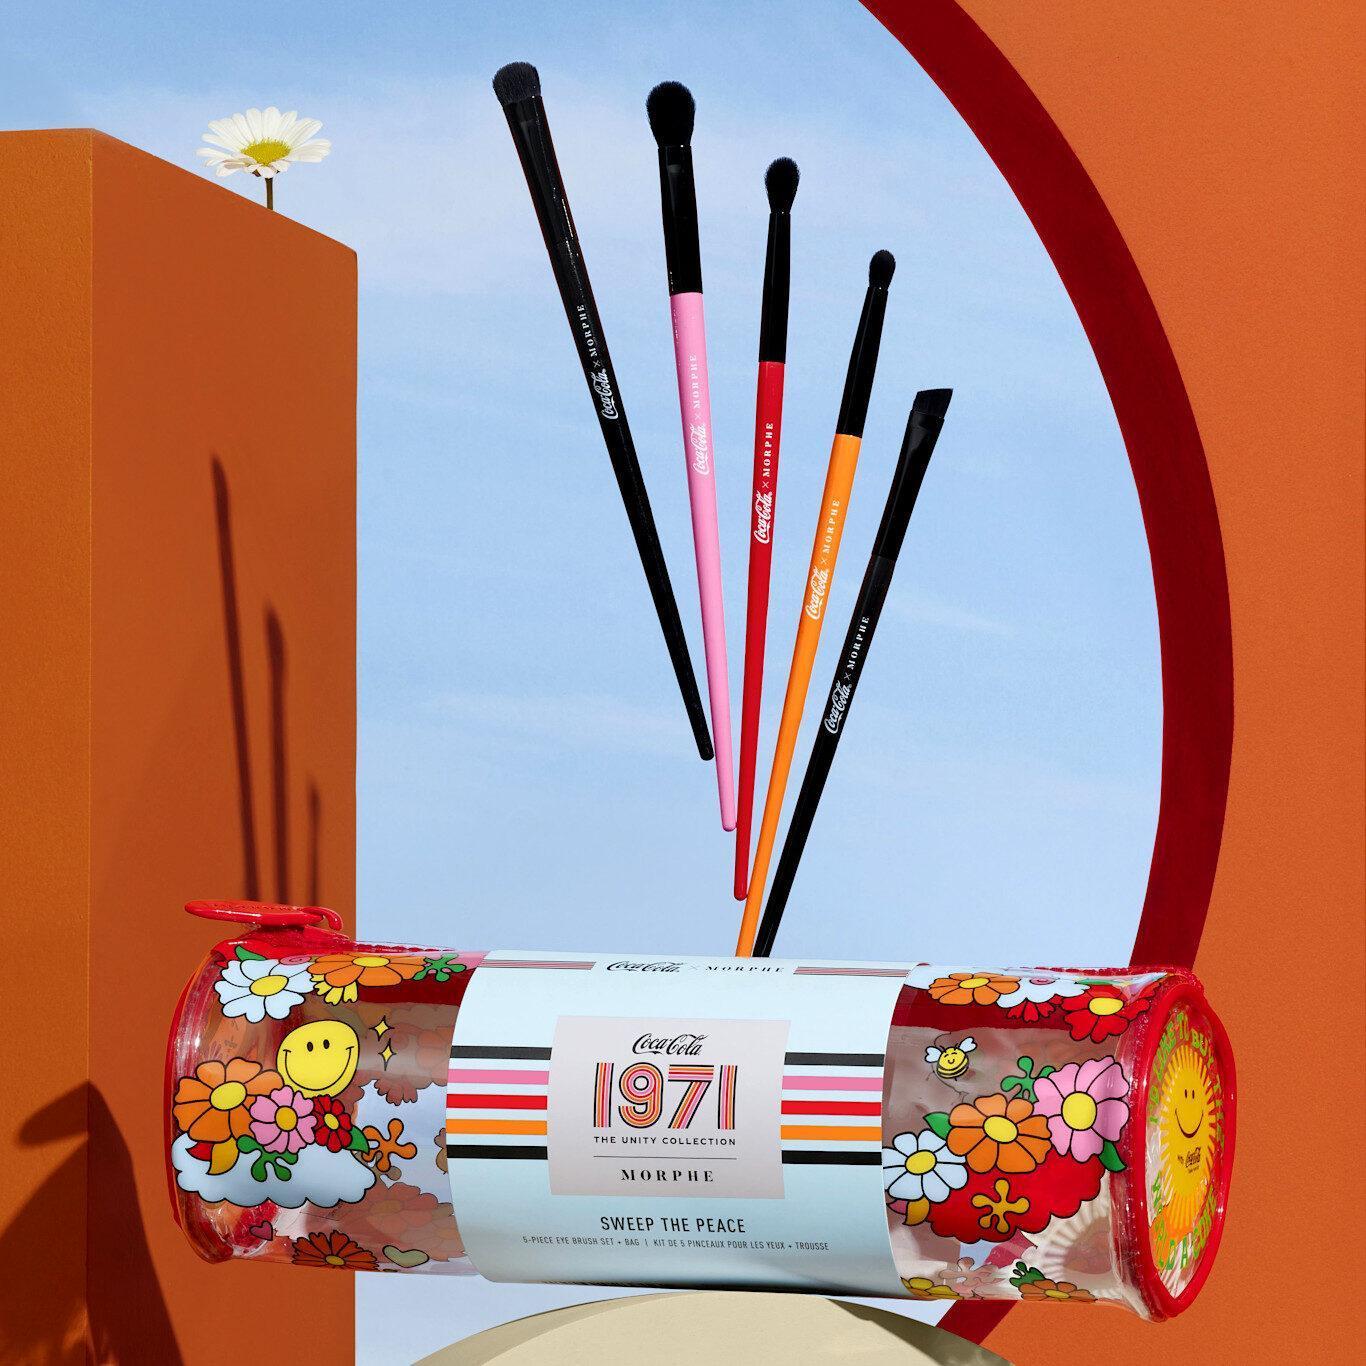 Morphe x Coca Cola 1971 Unity Collection Sweep The Peace 5 Piece Brush Set & Bag Promo